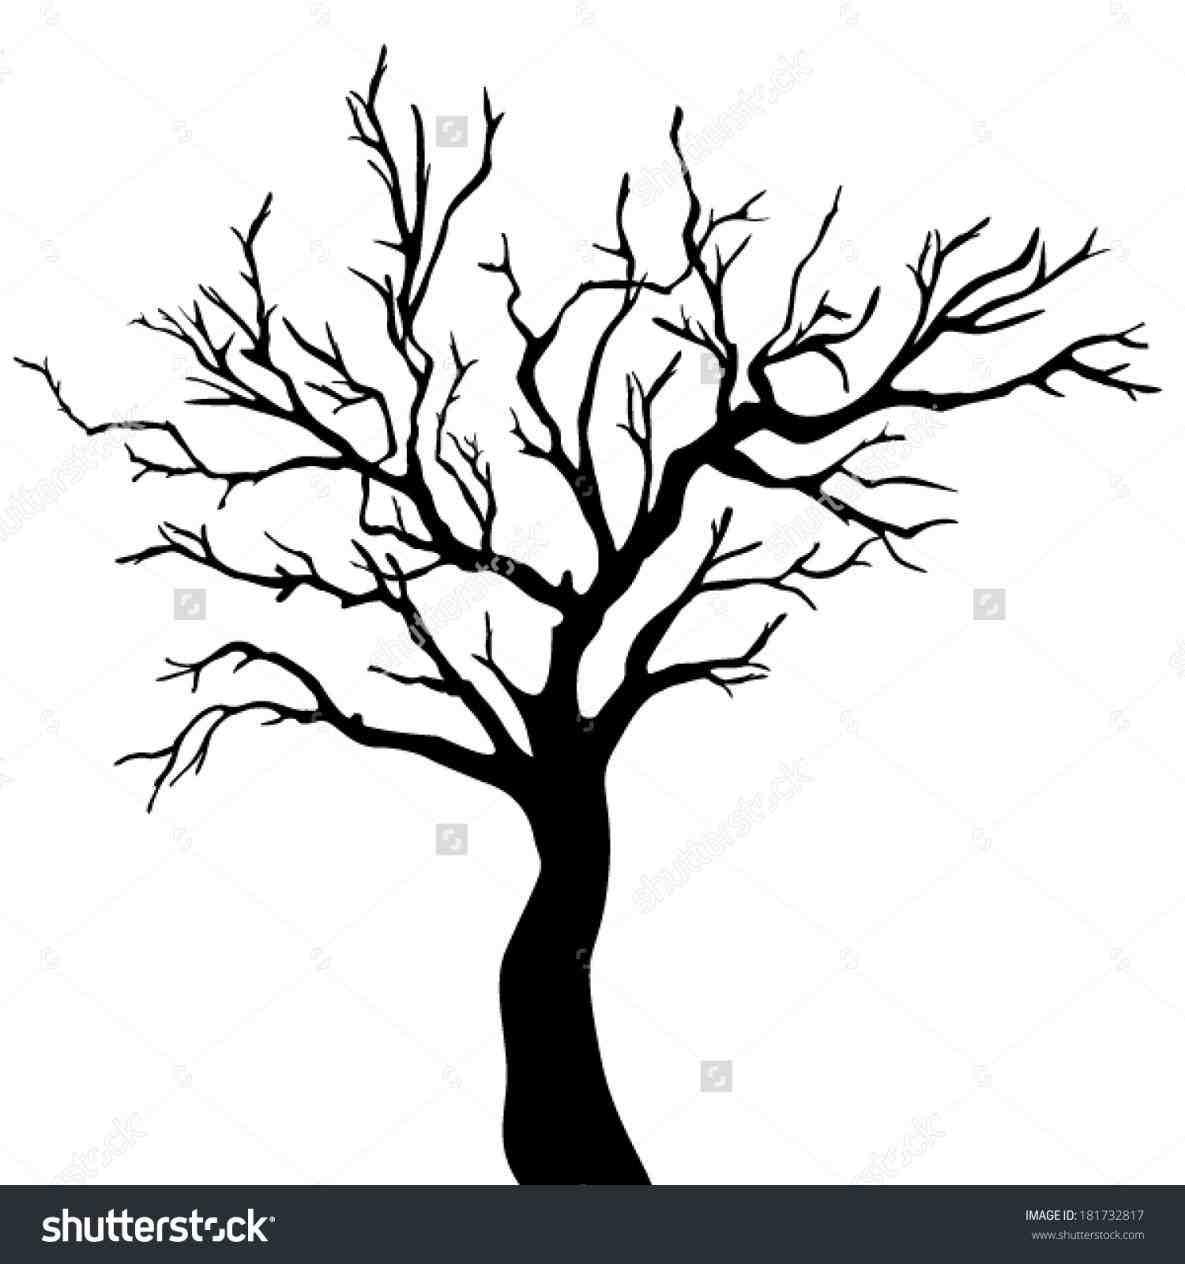 Drawn dead tree Ngorong drawing club ›